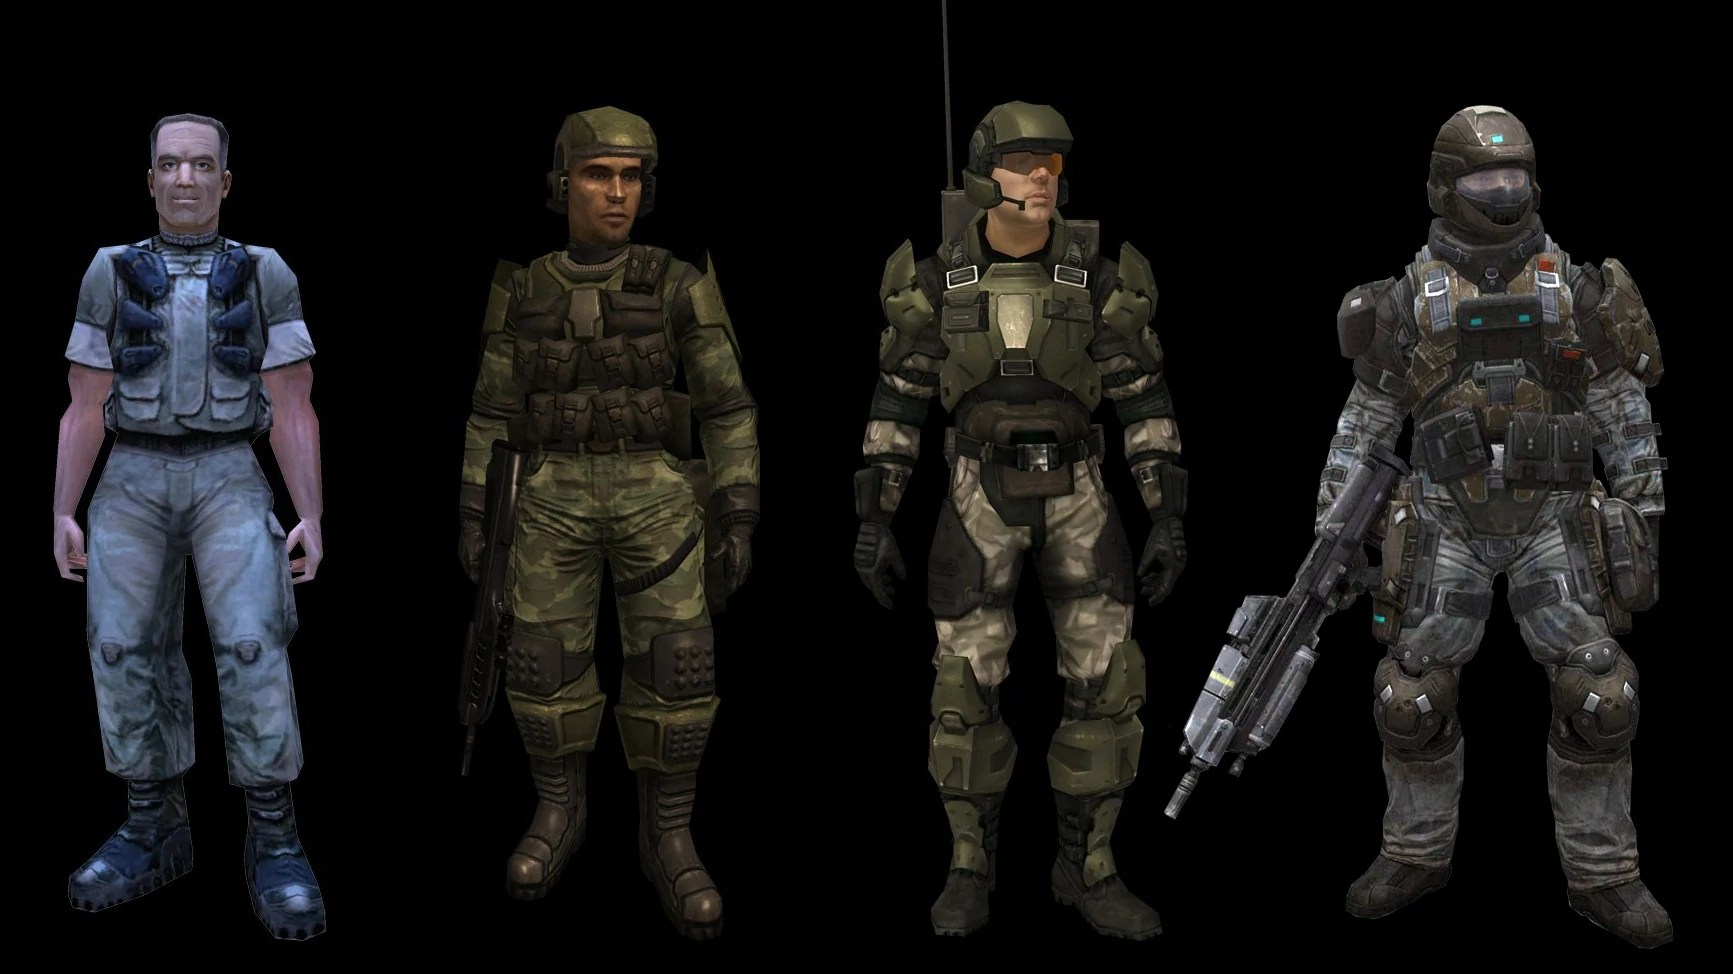 UNSC Marine Corps Battle Dress Uniform Halo Nation FANDOM Powered By Wikia